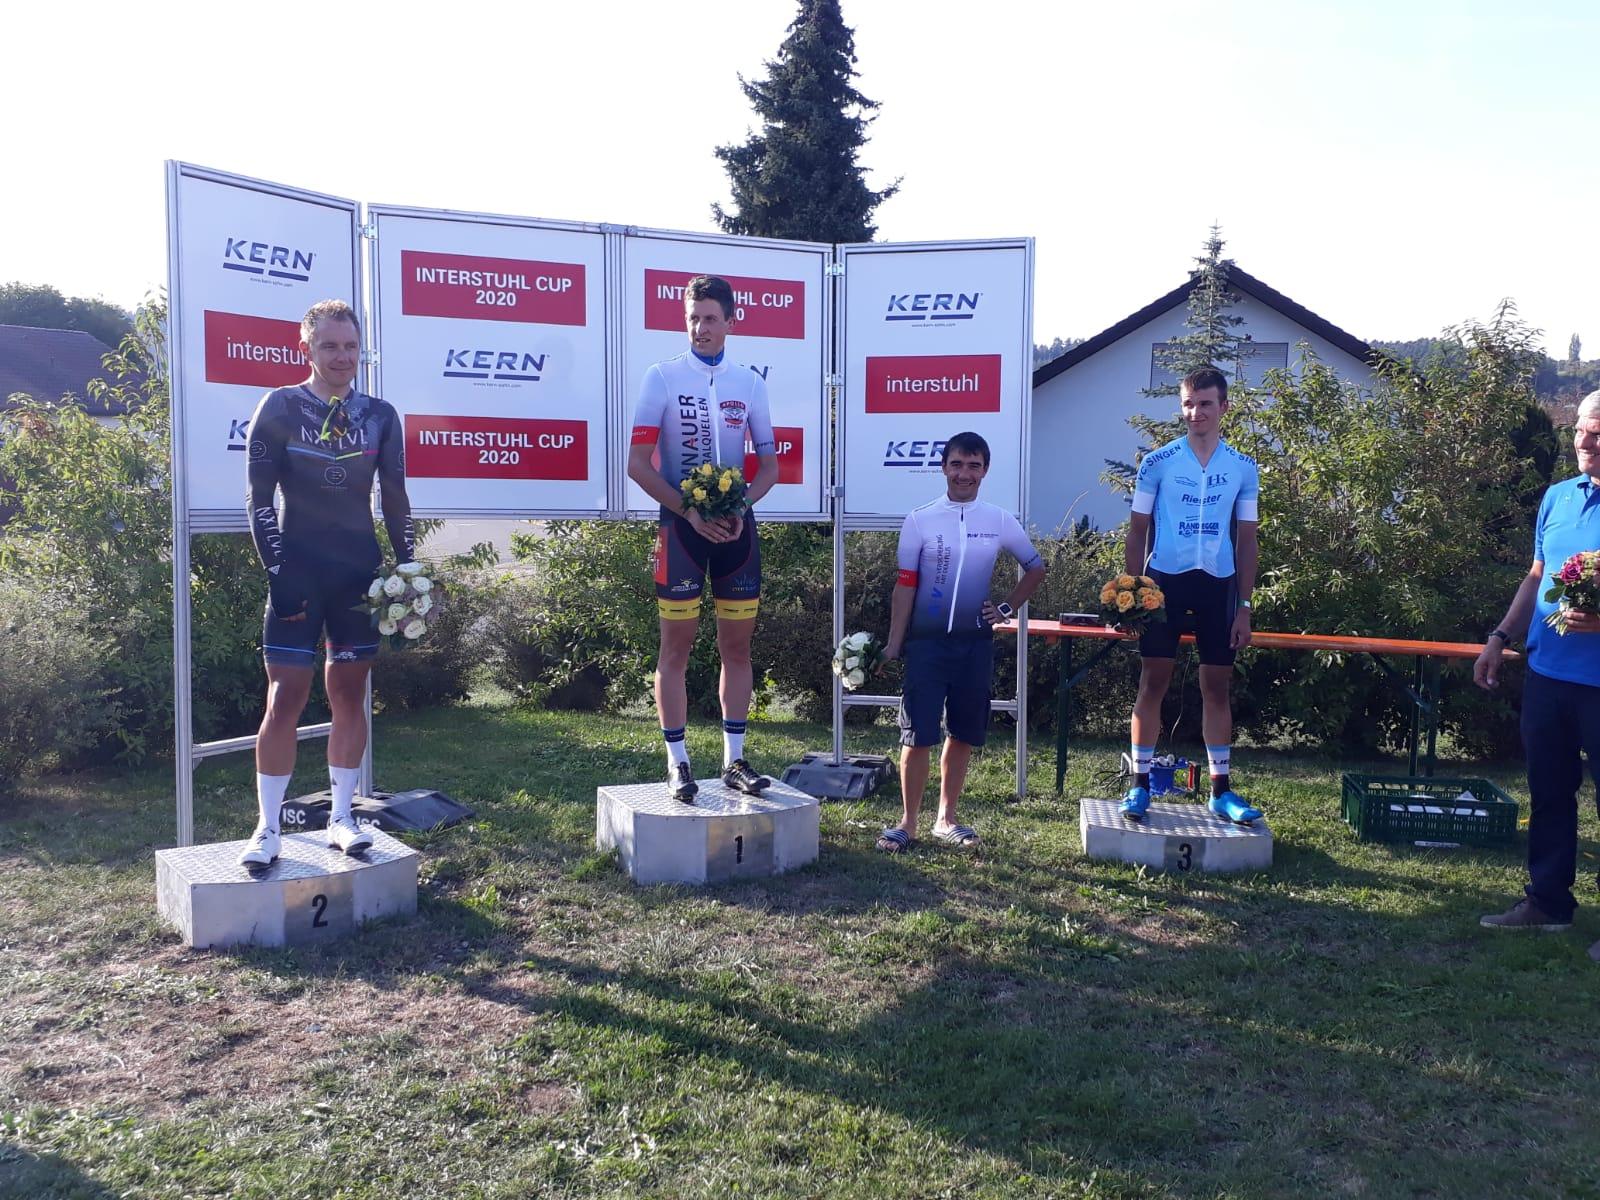 Stefan gewinnt das Sprinttrikot beim Interstuhl Cup in Geislingen bei Balingen